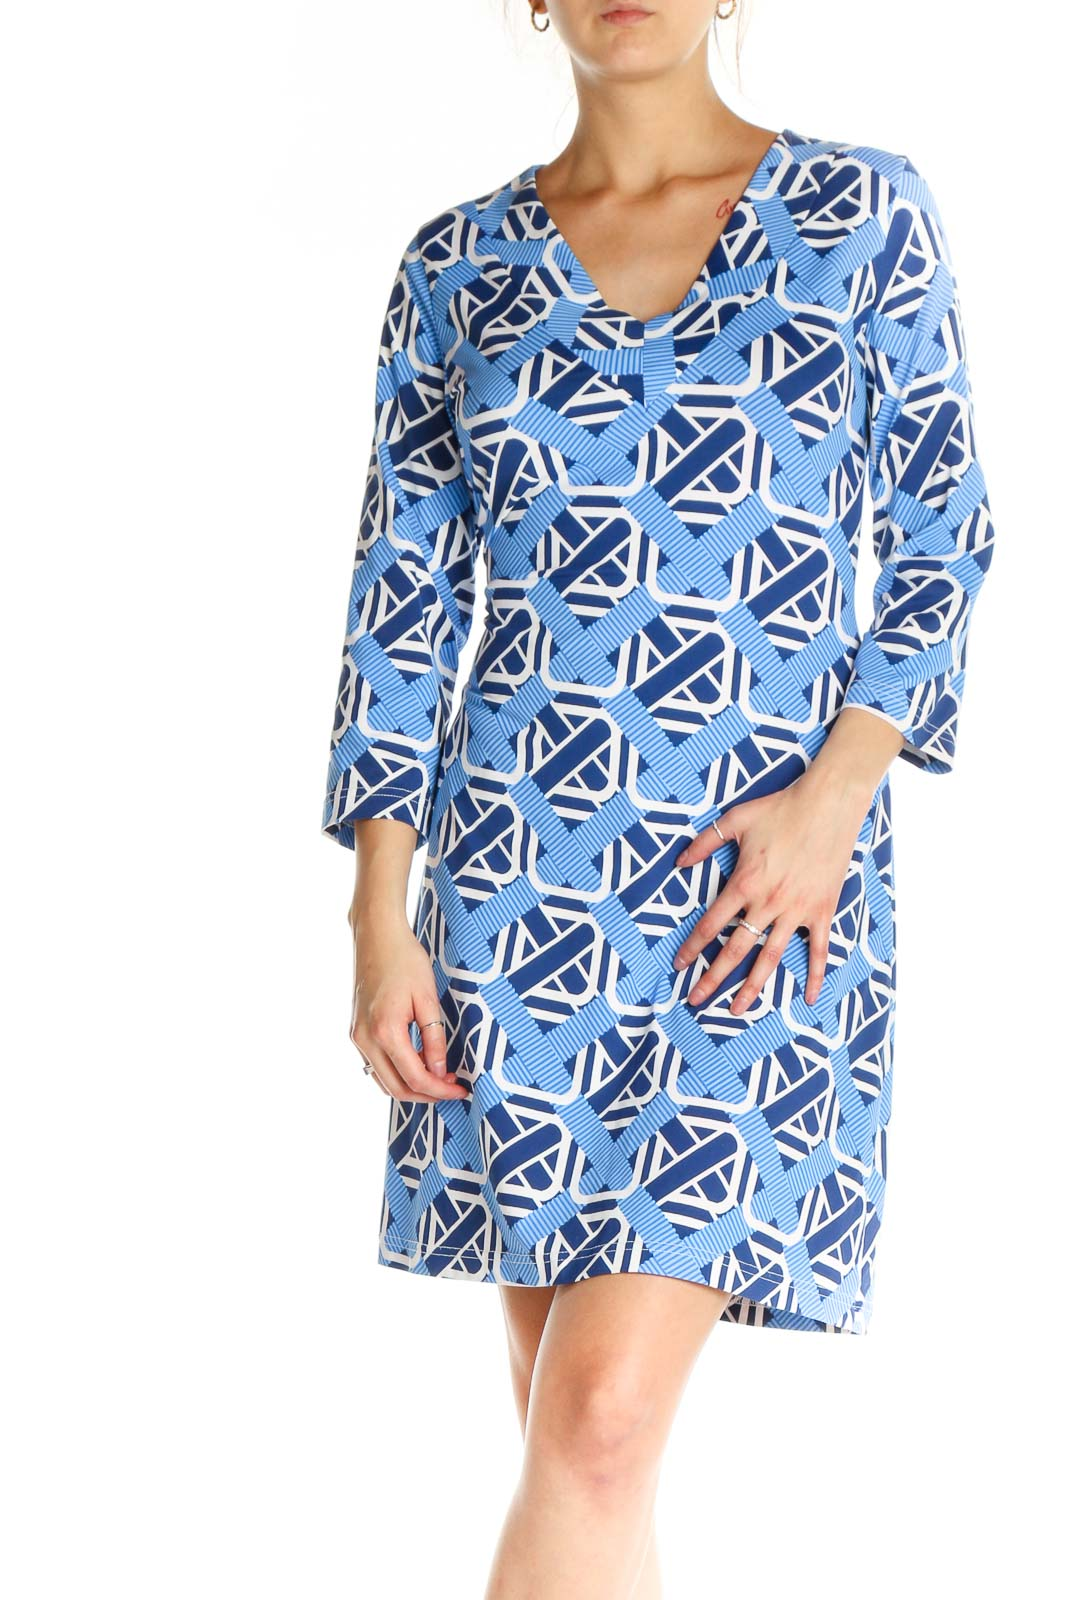 Blue Geometric Print Sheath Dress Front